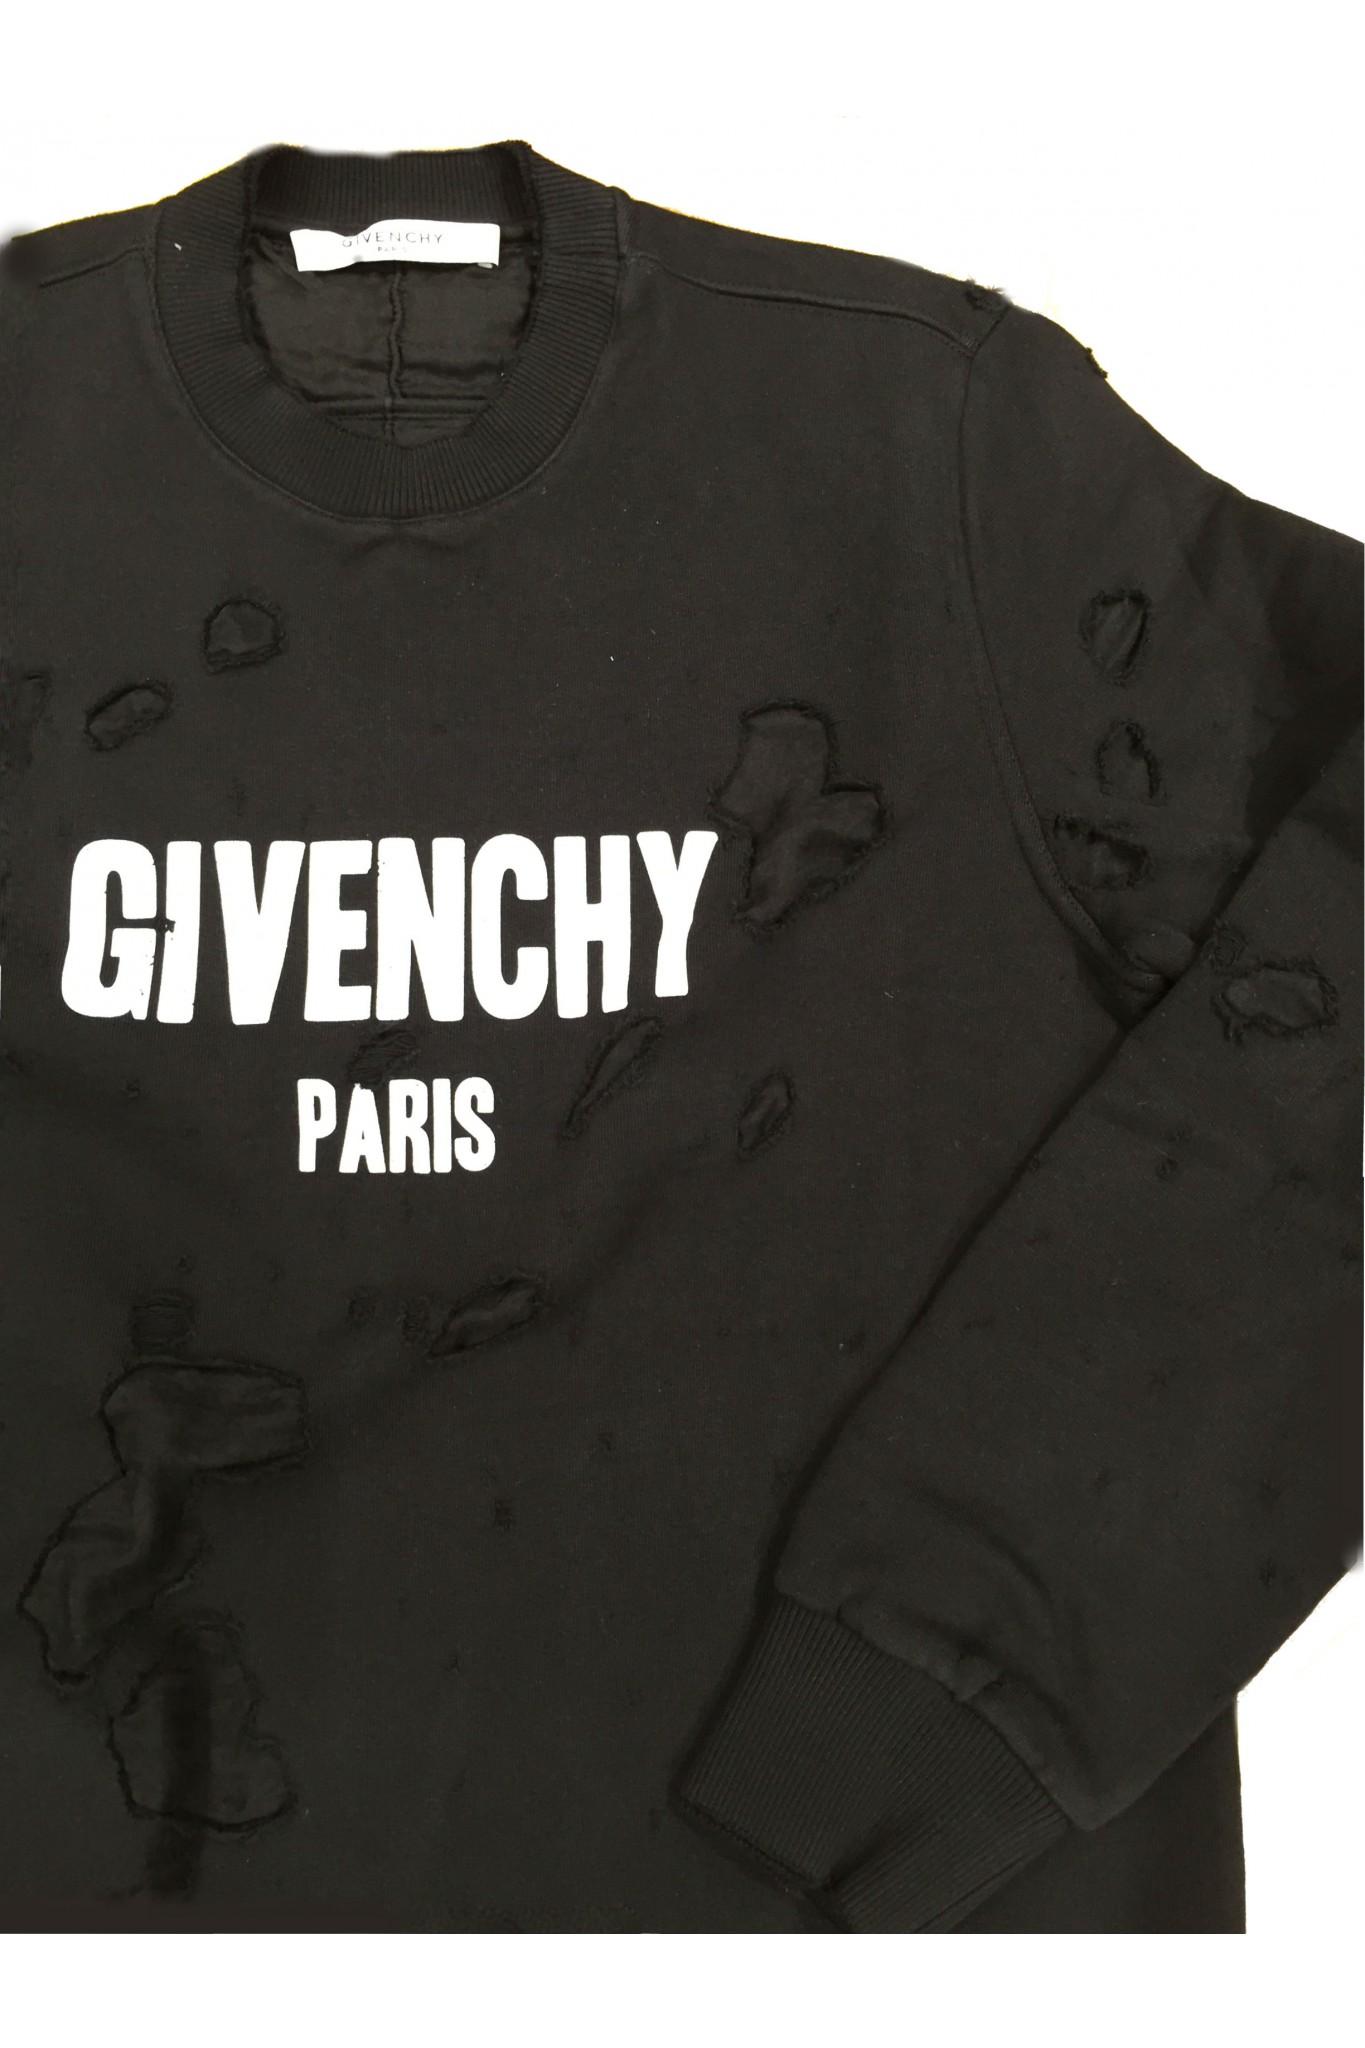 givenchy tee shirt sale sale   OFF71% Discounts 7d561b8764c7